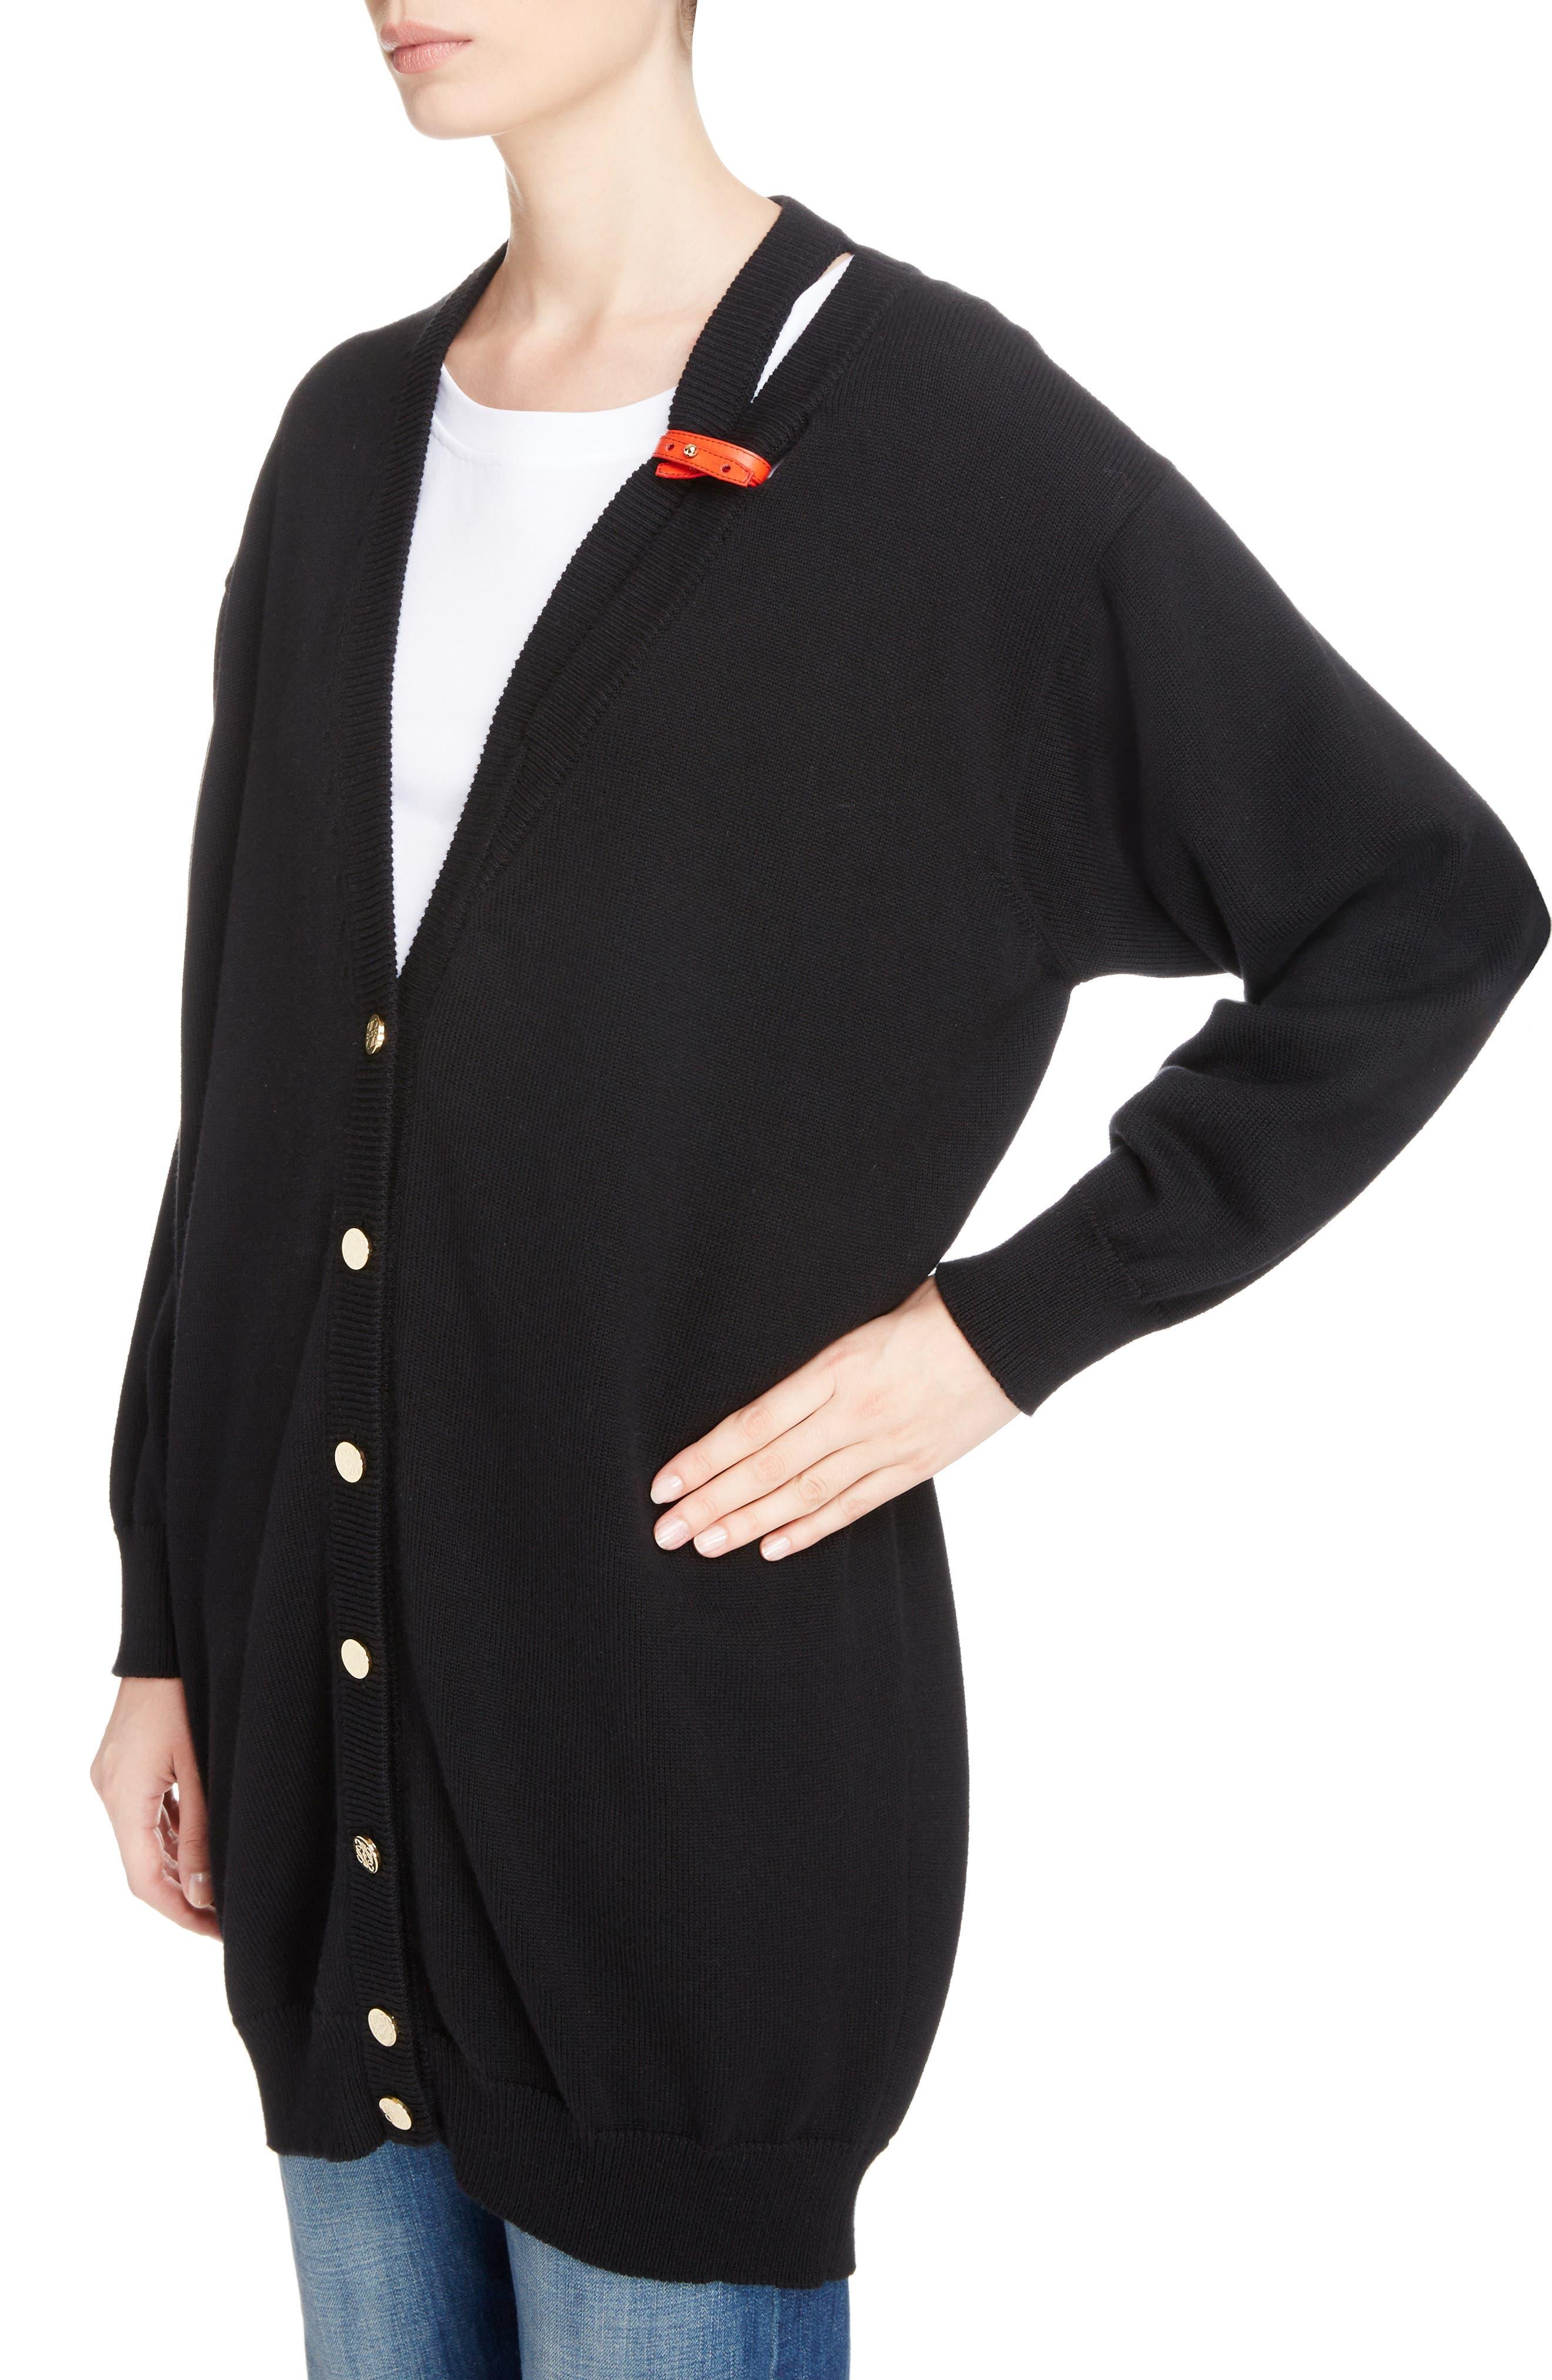 Alternate Image 3  - Loewe Leather Band Cotton & Cashmere Cardigan